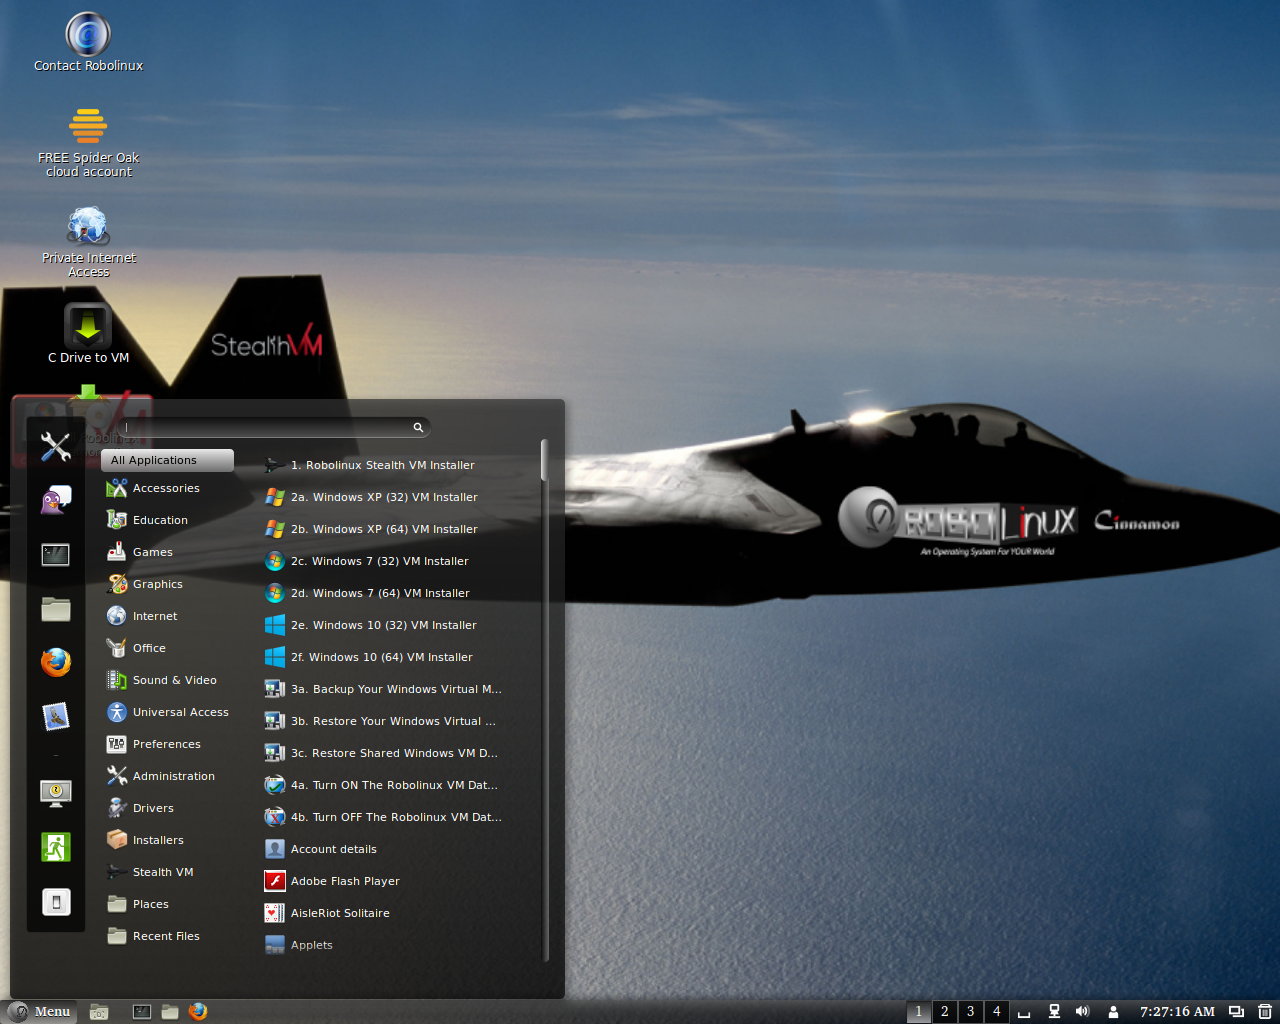 Robolinux 8.8.1 发布,基于 Debian 的 Linux 发行版